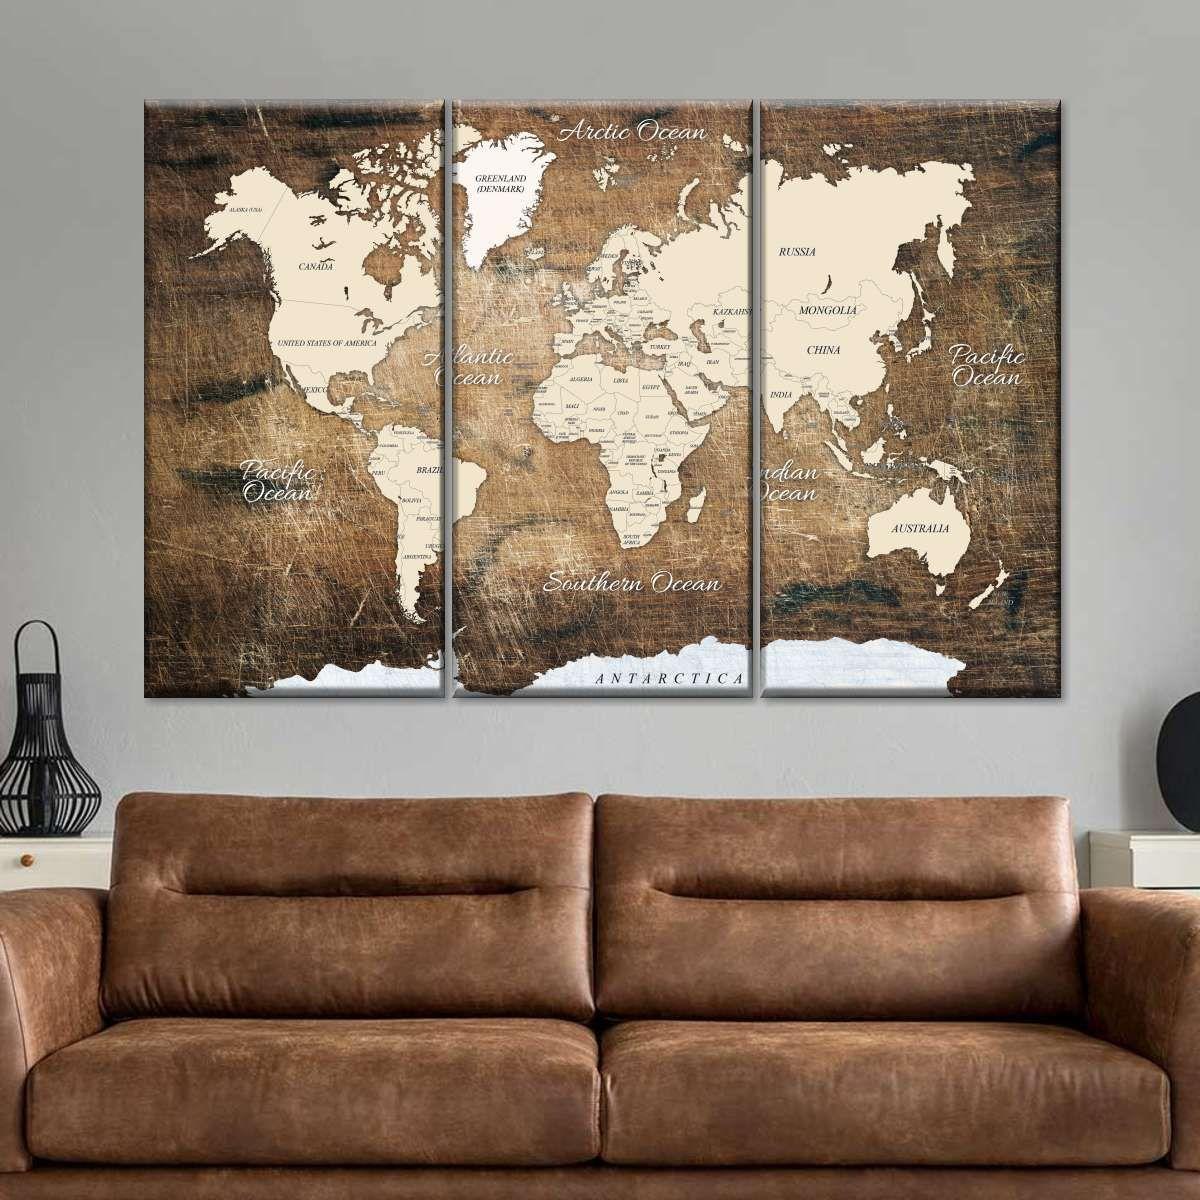 World Map On Ancient Wood Multi Panel Canvas Wall Art In 2021 Wall Canvas World Map Decor Canvas Wall Art